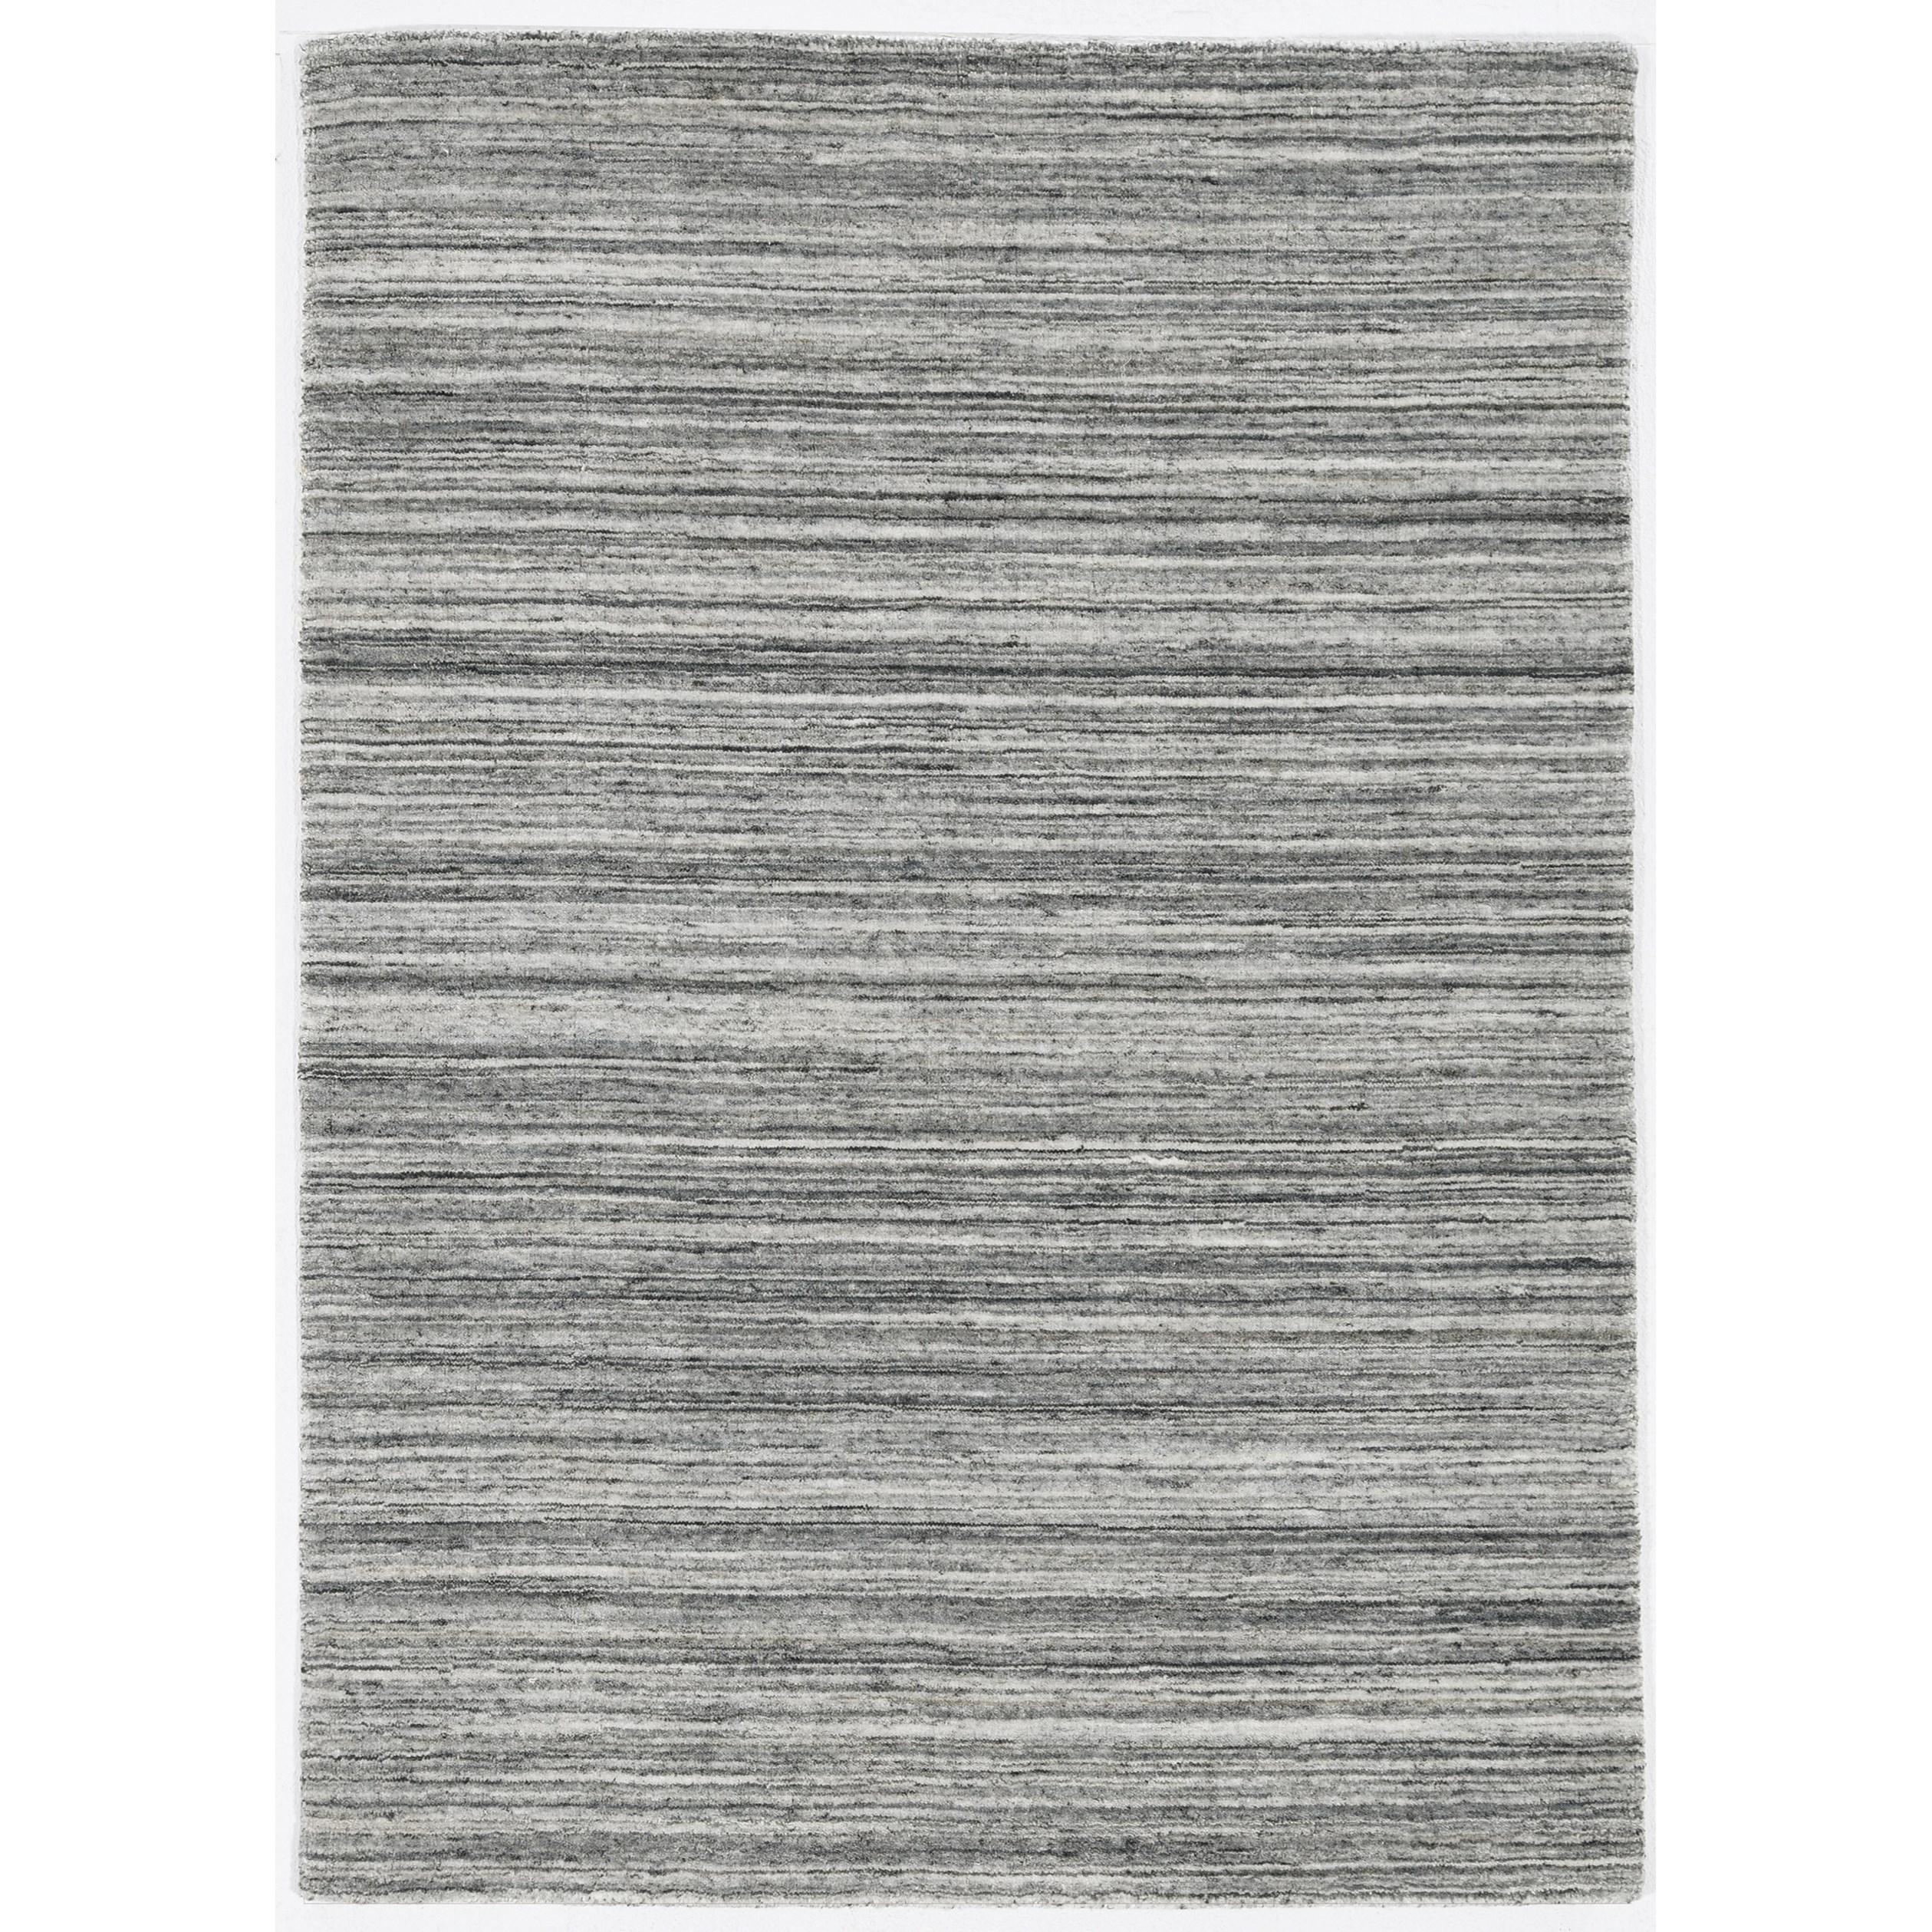 Dune 5' x 8' Grey Villa Rug by Kas at Darvin Furniture